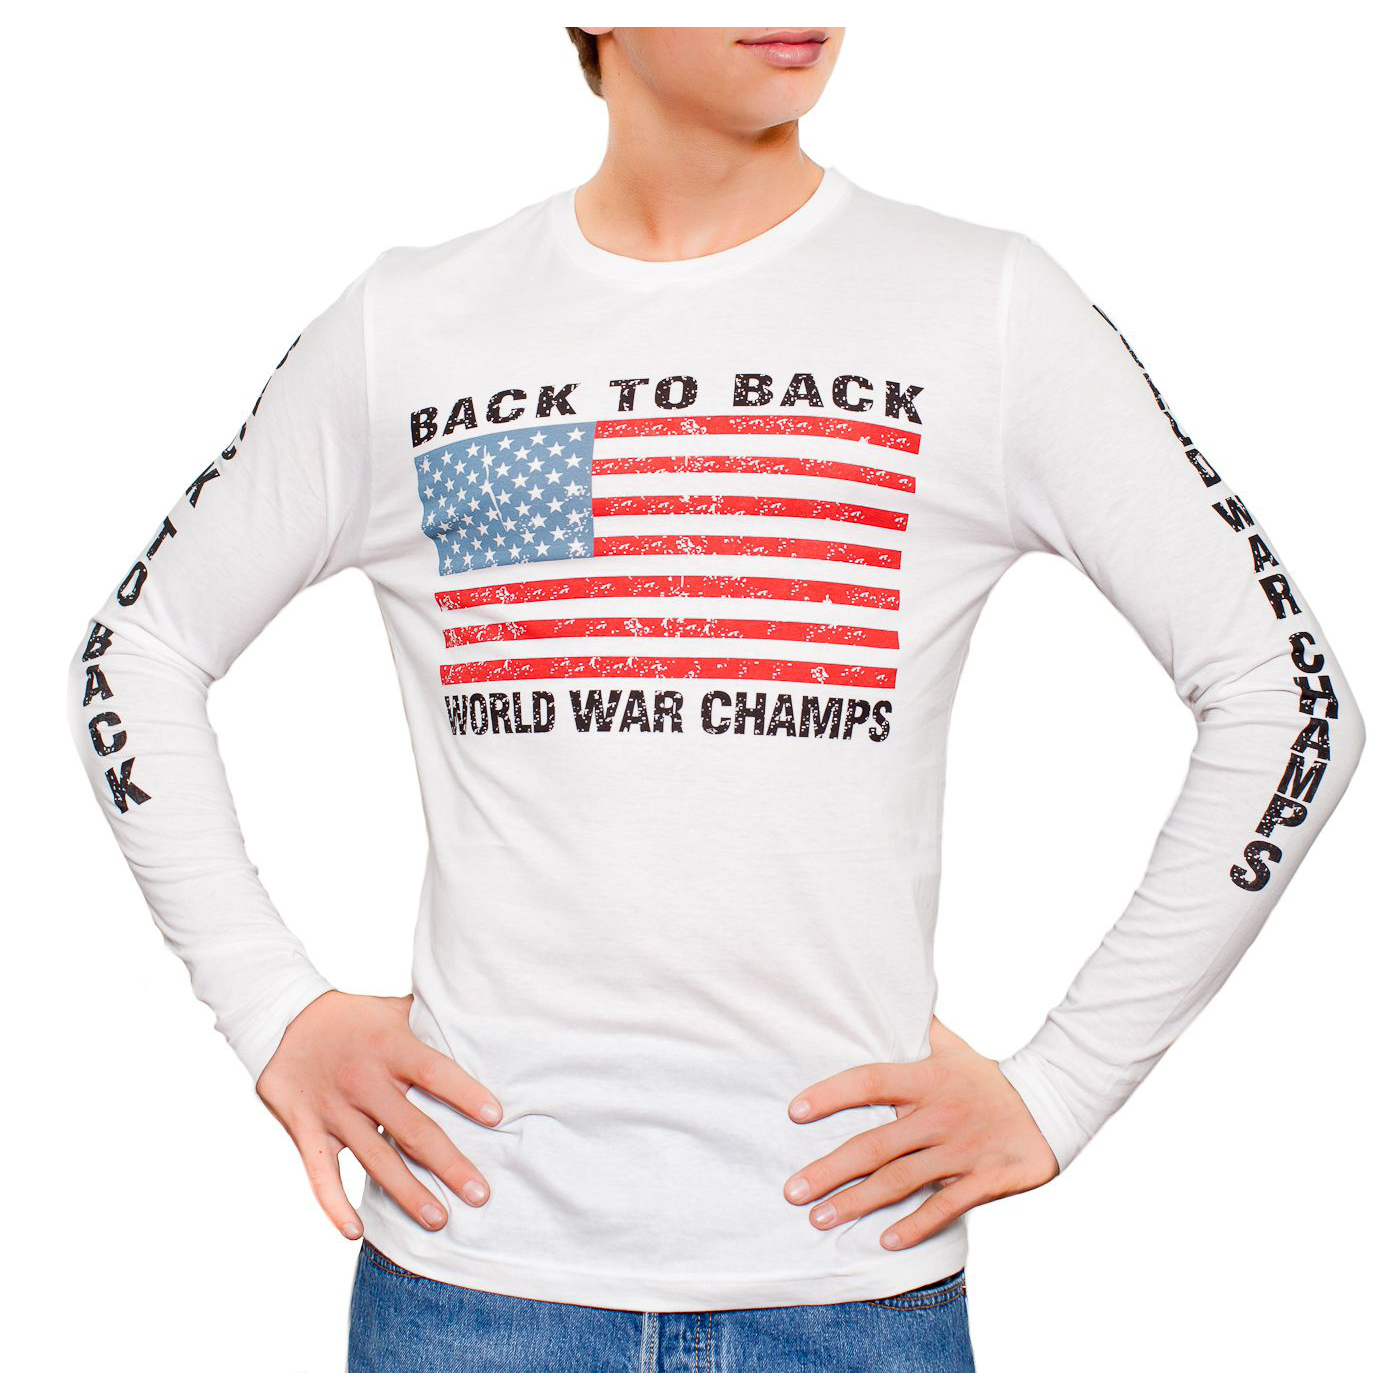 b78a7cf83 ... Back World War Champs L/S Long Sleeve T-shirt S-3XL. B2BWWC_LS_WHITE